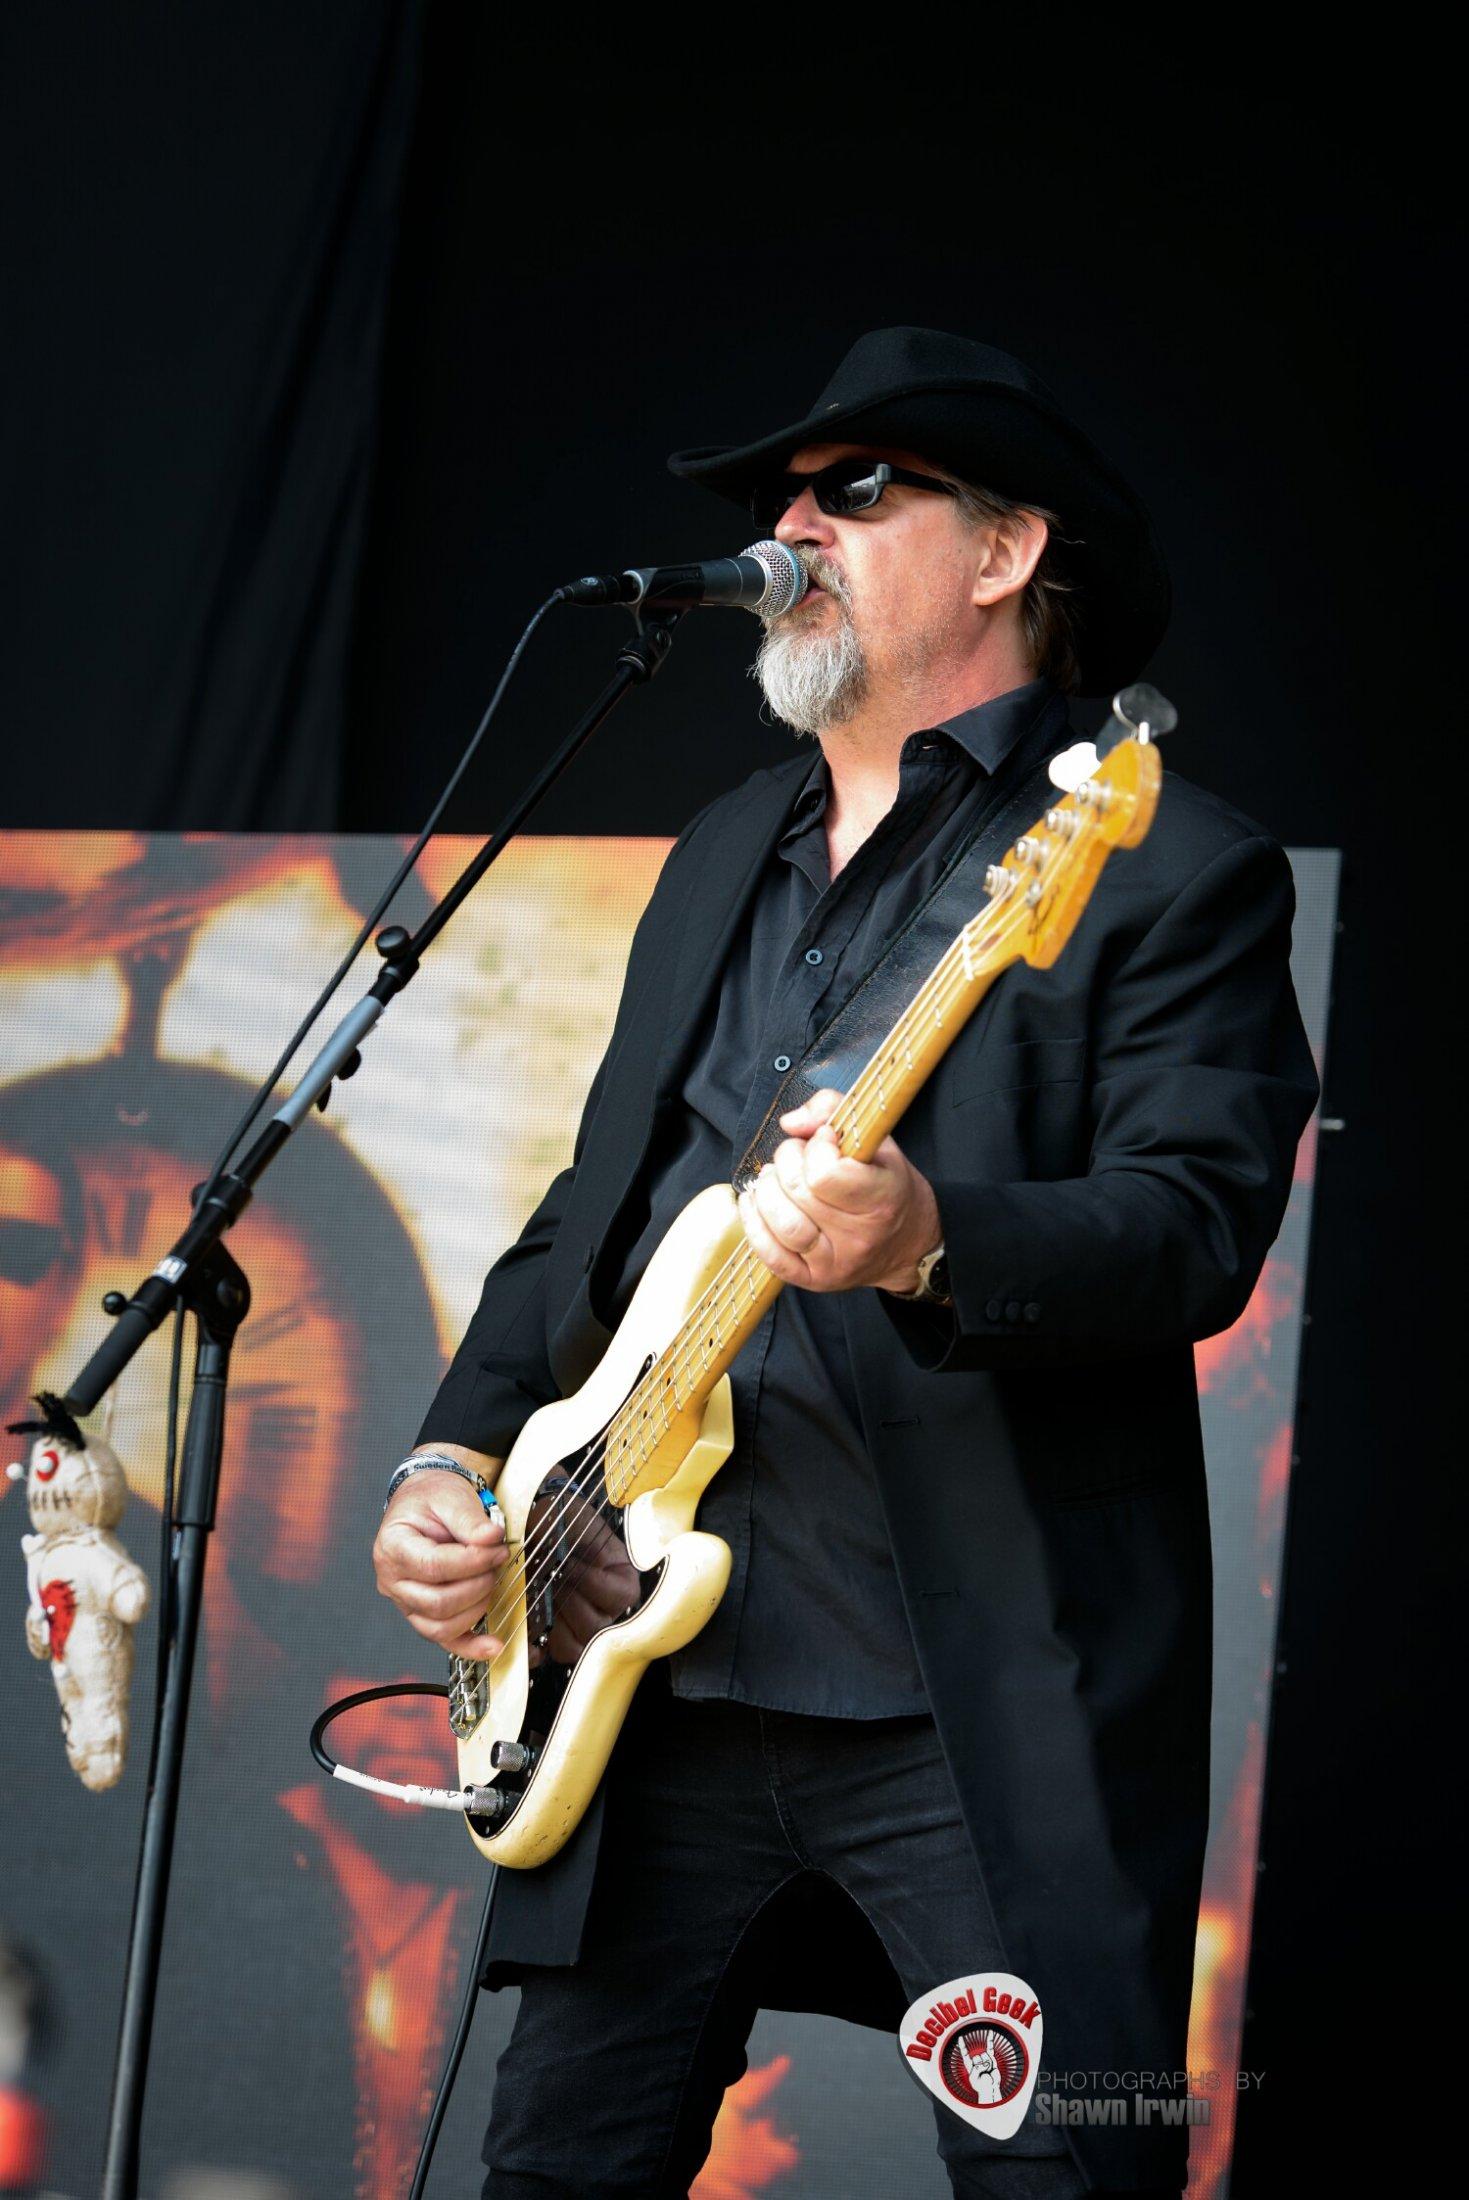 James Holkworth The Coolbenders #16-Sweden Rock 2019-Shawn Irwin